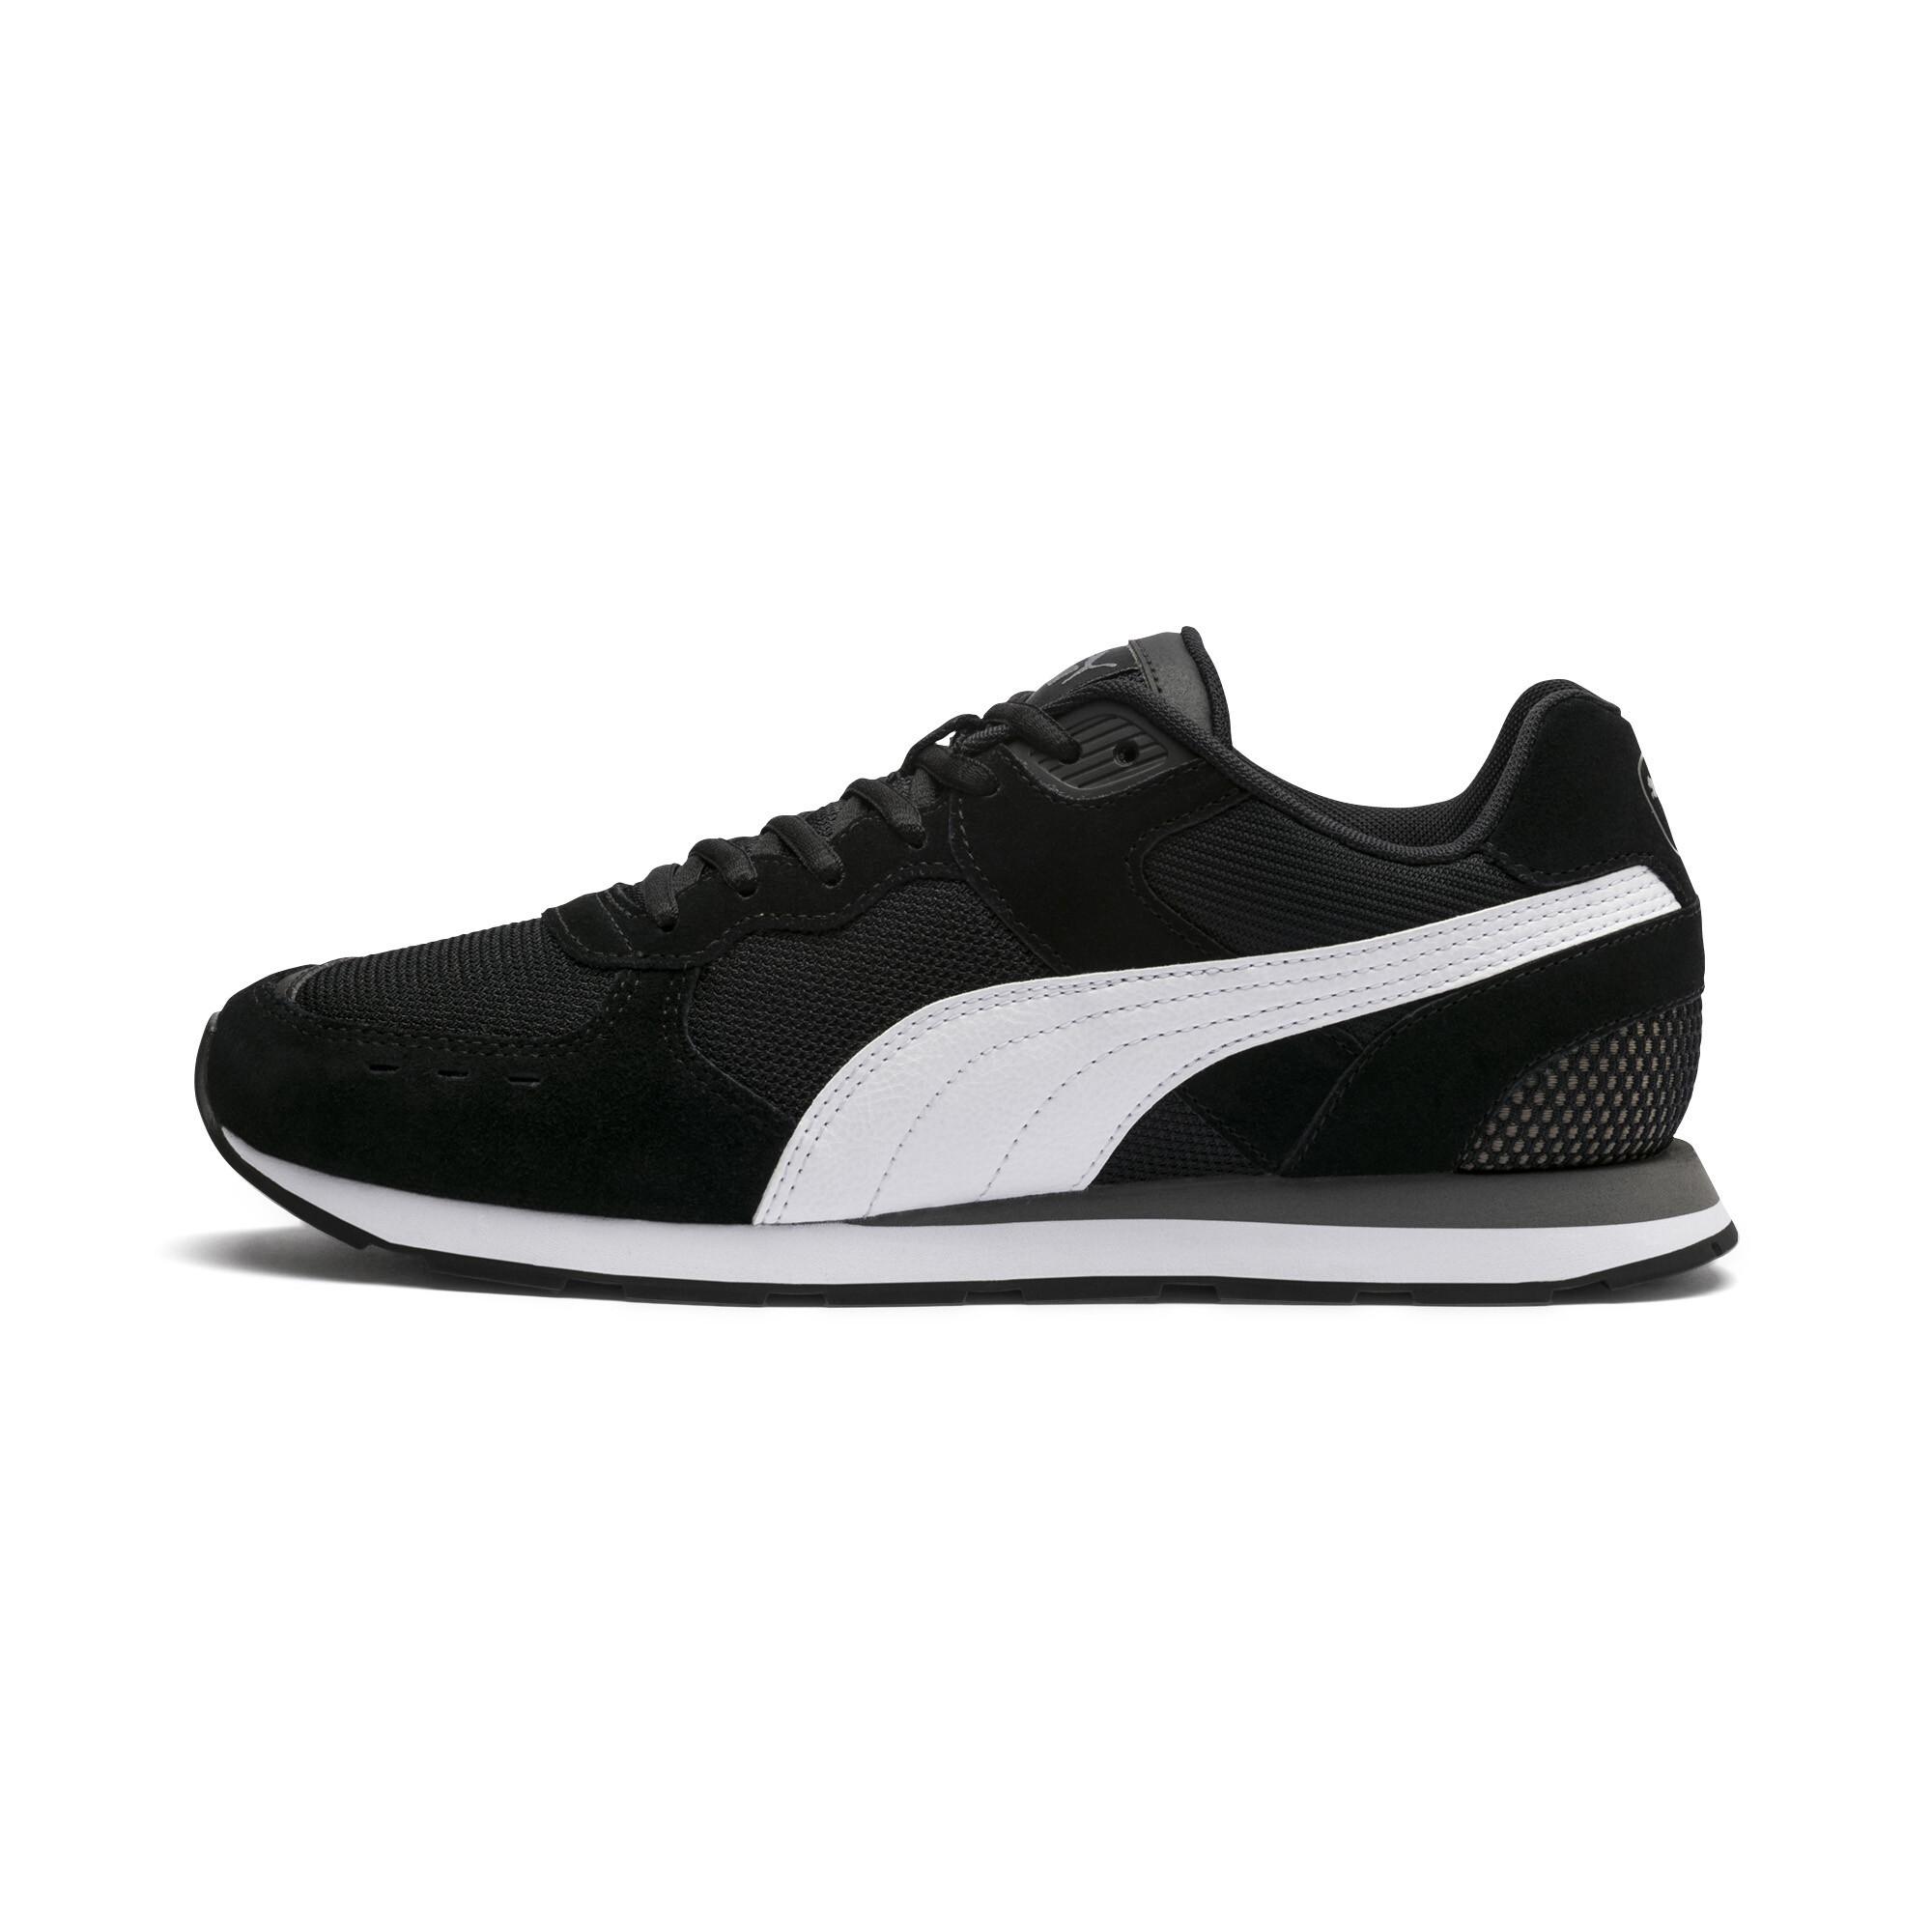 PUMA-Vista-Women-s-Sneakers-Women-Shoe-Basics thumbnail 4